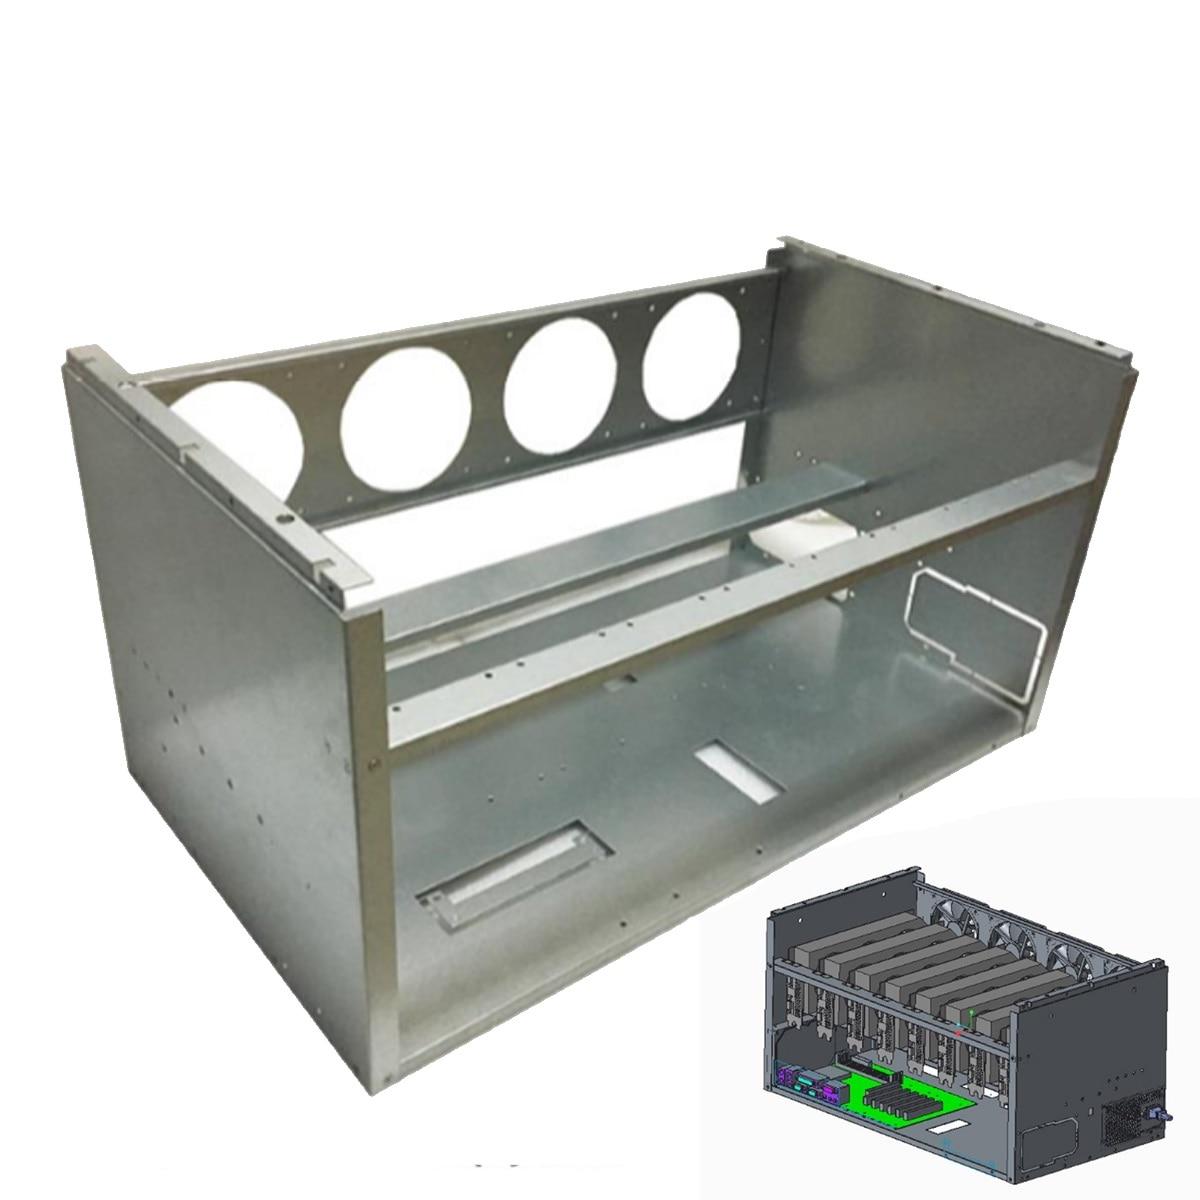 New 8 GPU 4 Fans Open Air Pro Mining Computer Alloy Case Frame Rig Stackable Case for 8 GPU ETH BTC ZEC Ethereum